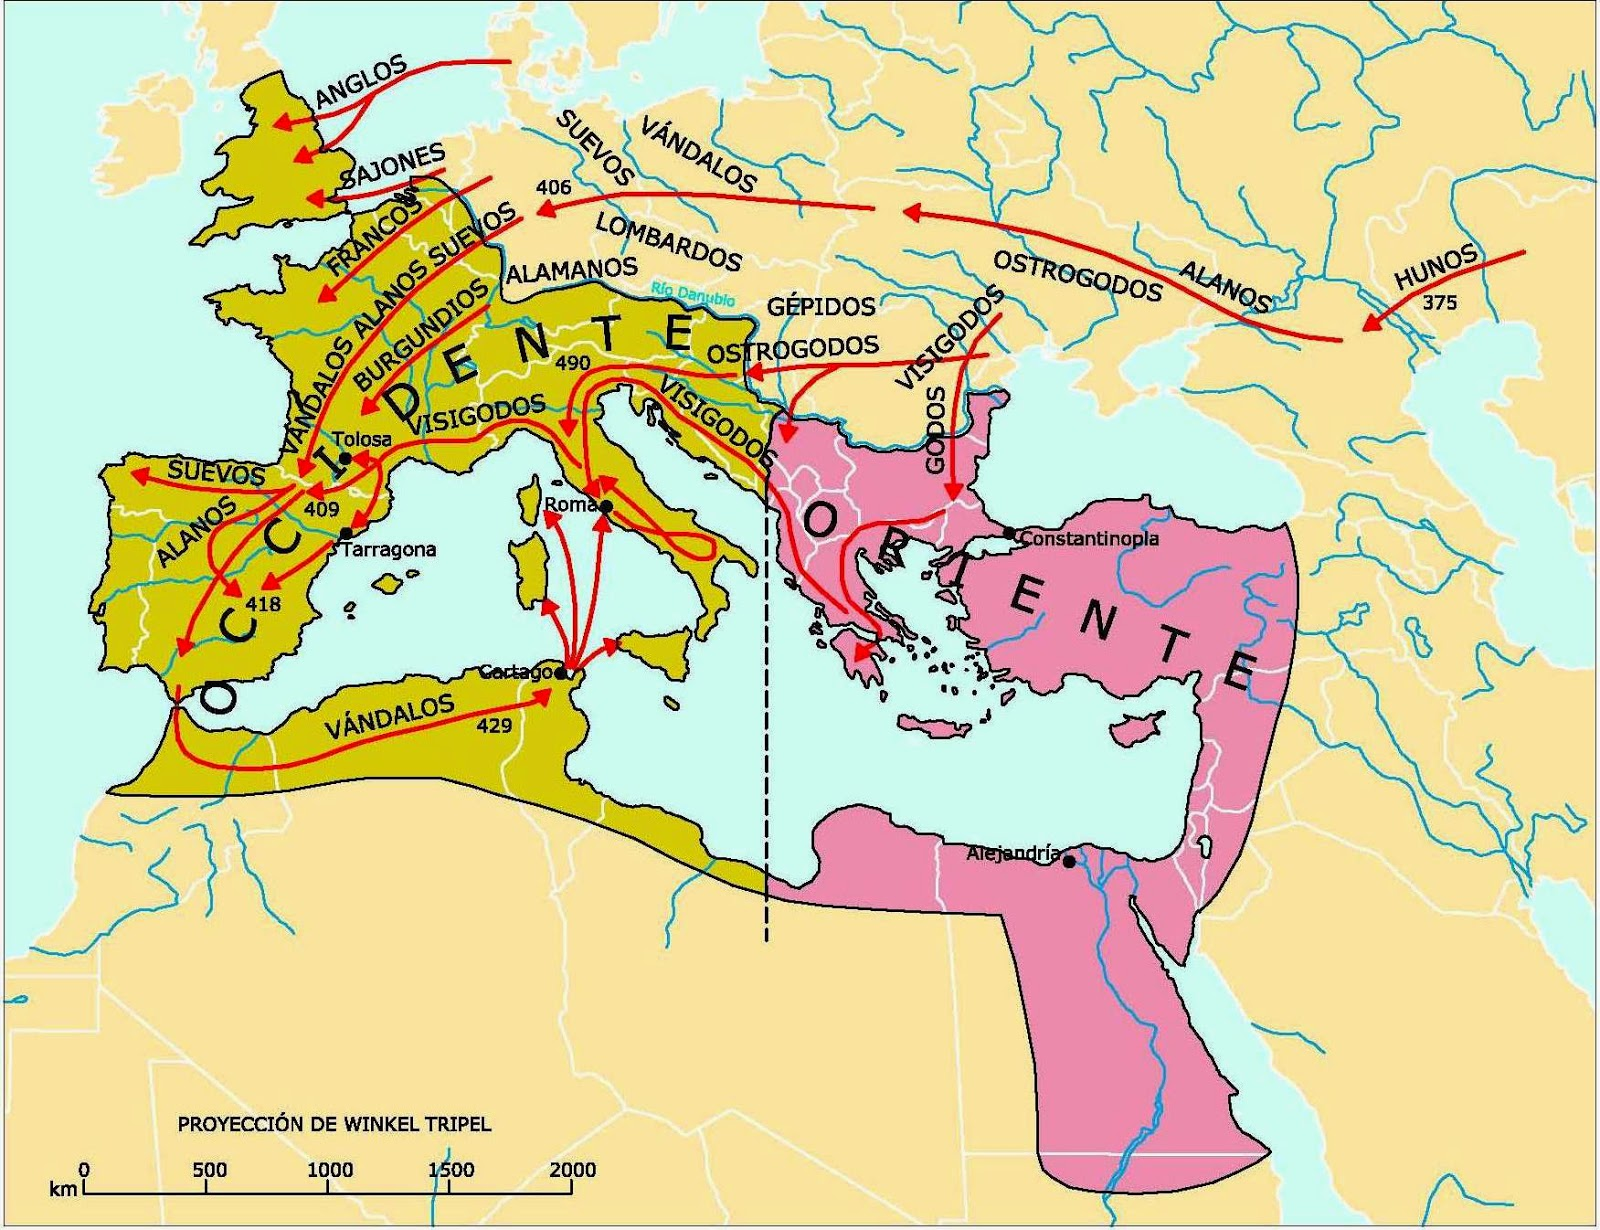 Profesor De Historia Geografia Y Arte Roma Antigua